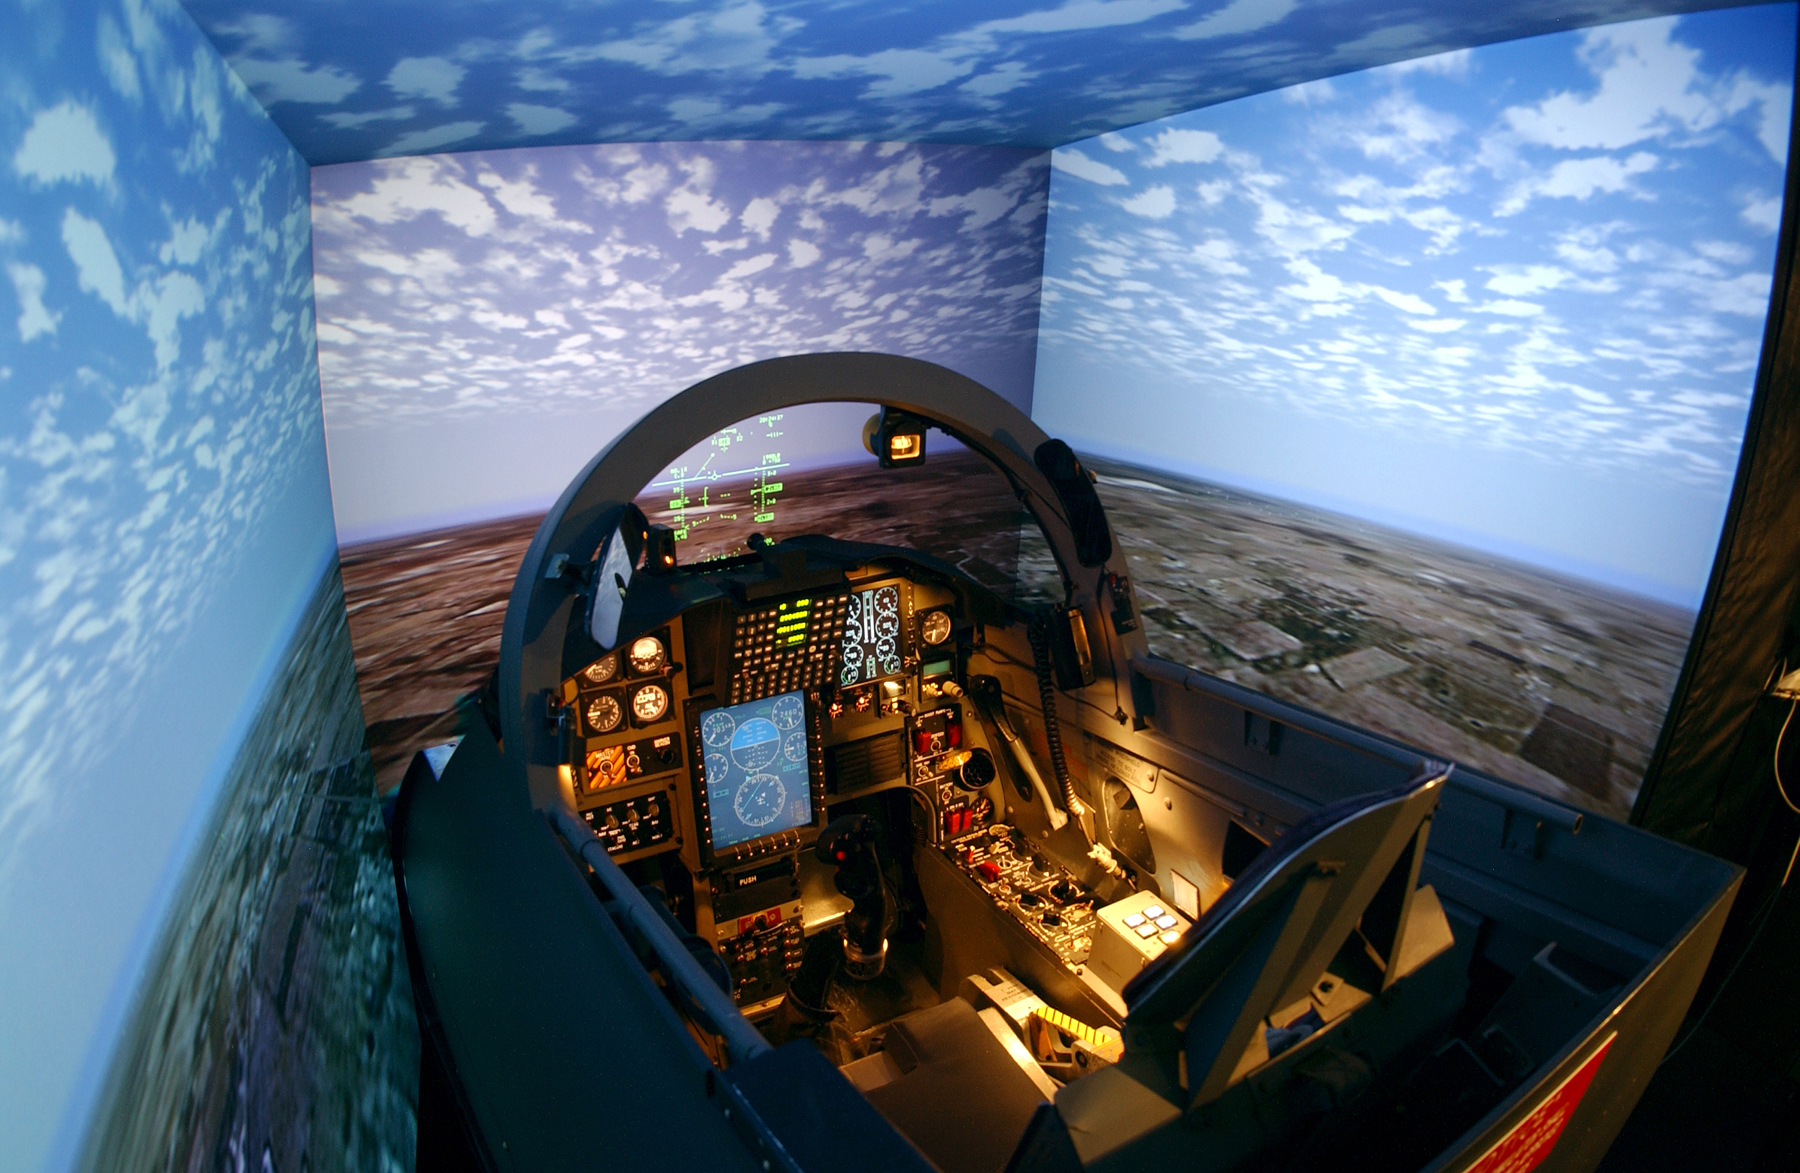 Last randolph t 38a simulator shut down u s air force for Online house builder simulator